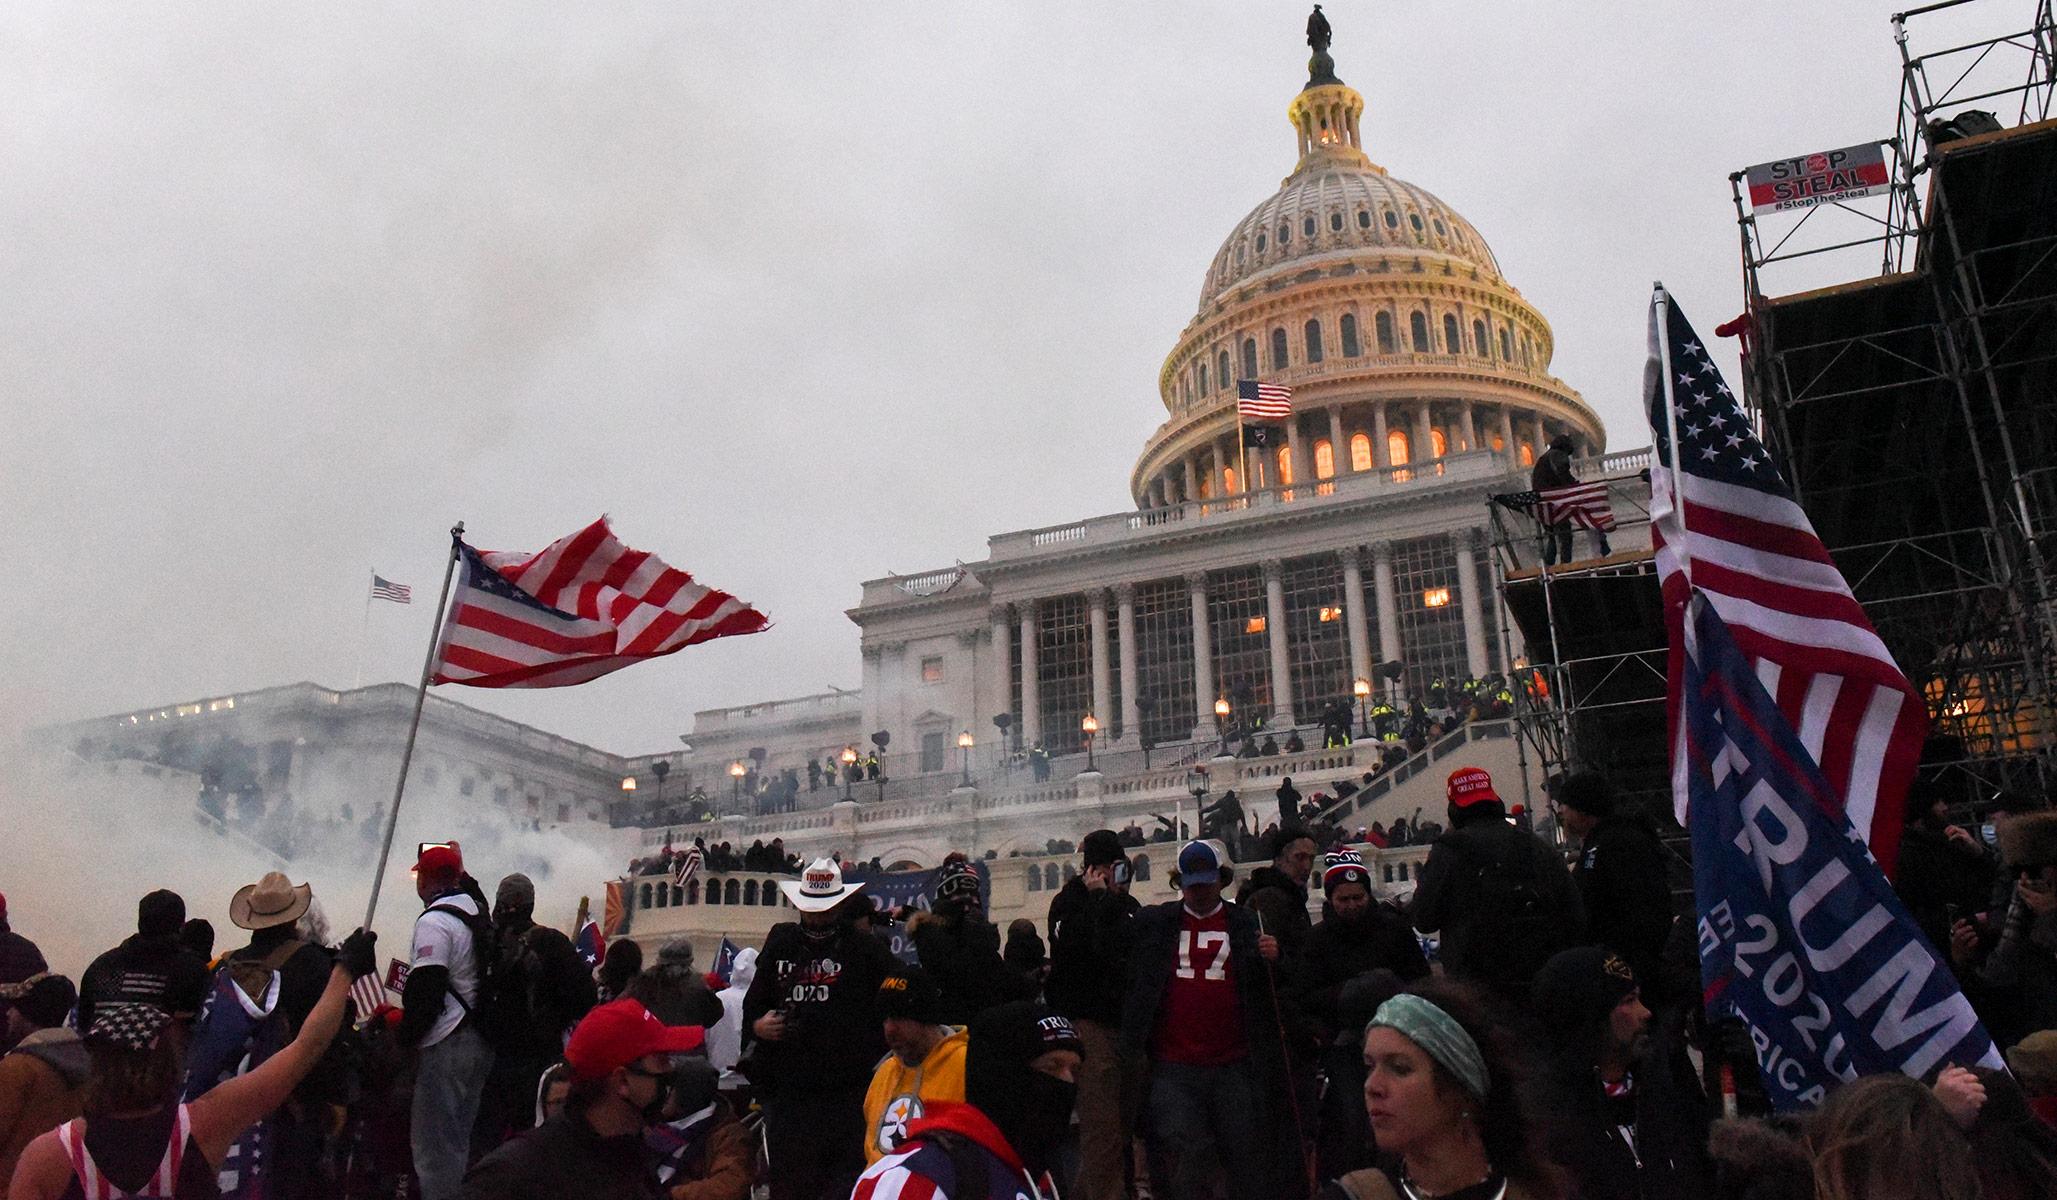 January 6 Committee Subpoenas Former Trump Advisers, Escalating Probe